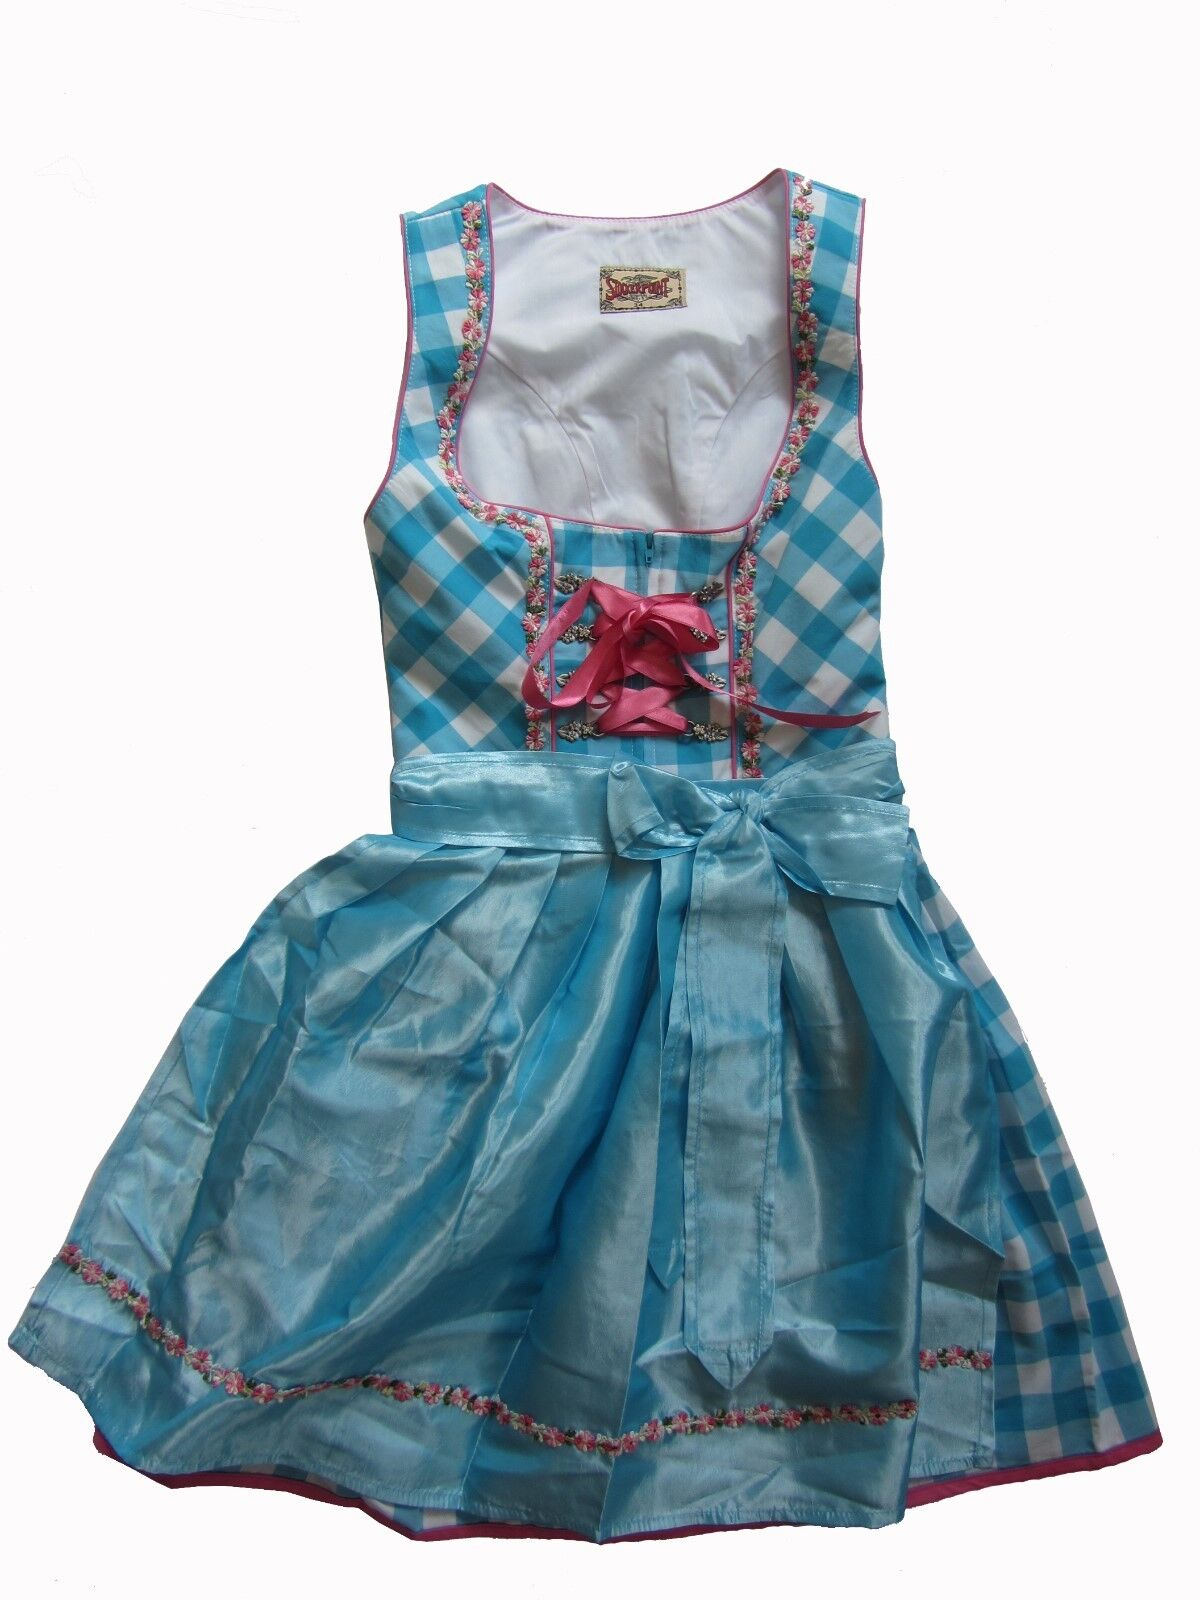 Stockerpoint du Joy turquoise 32 34 36 38 costume traditionnel wiesn Court Mini Bleu Clair voiturereaux